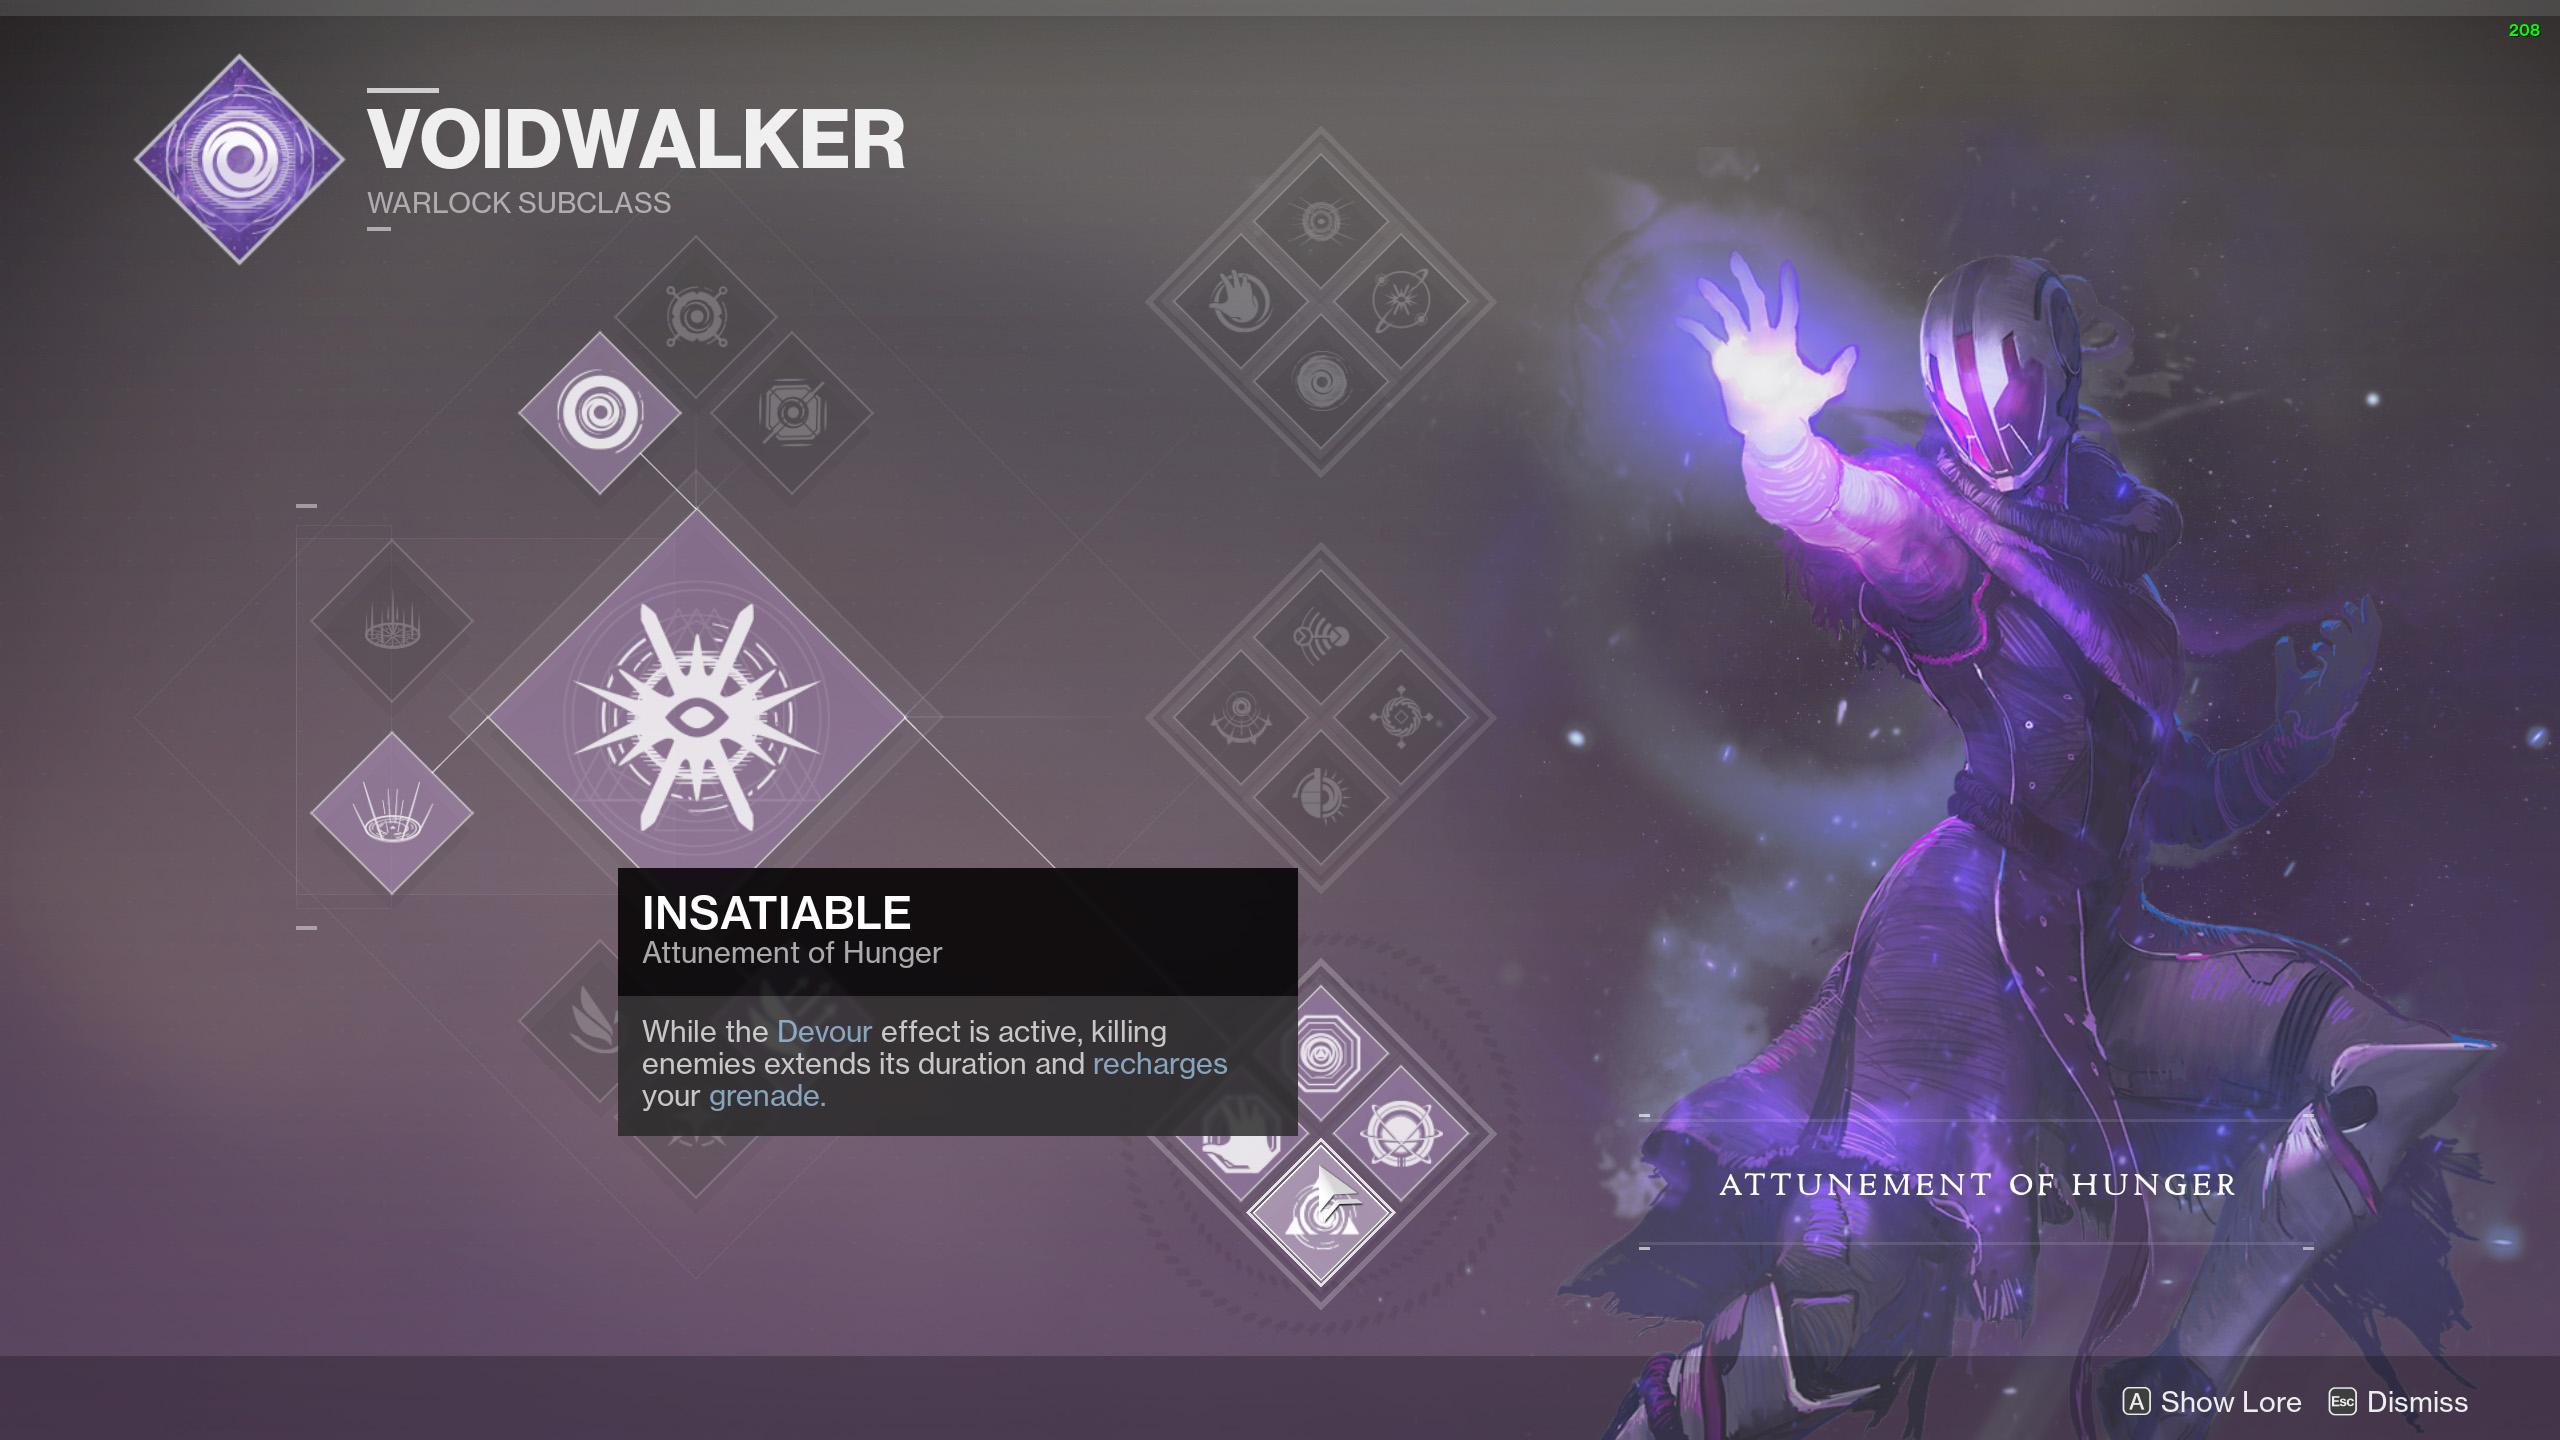 Destiny 2 Voidwalker